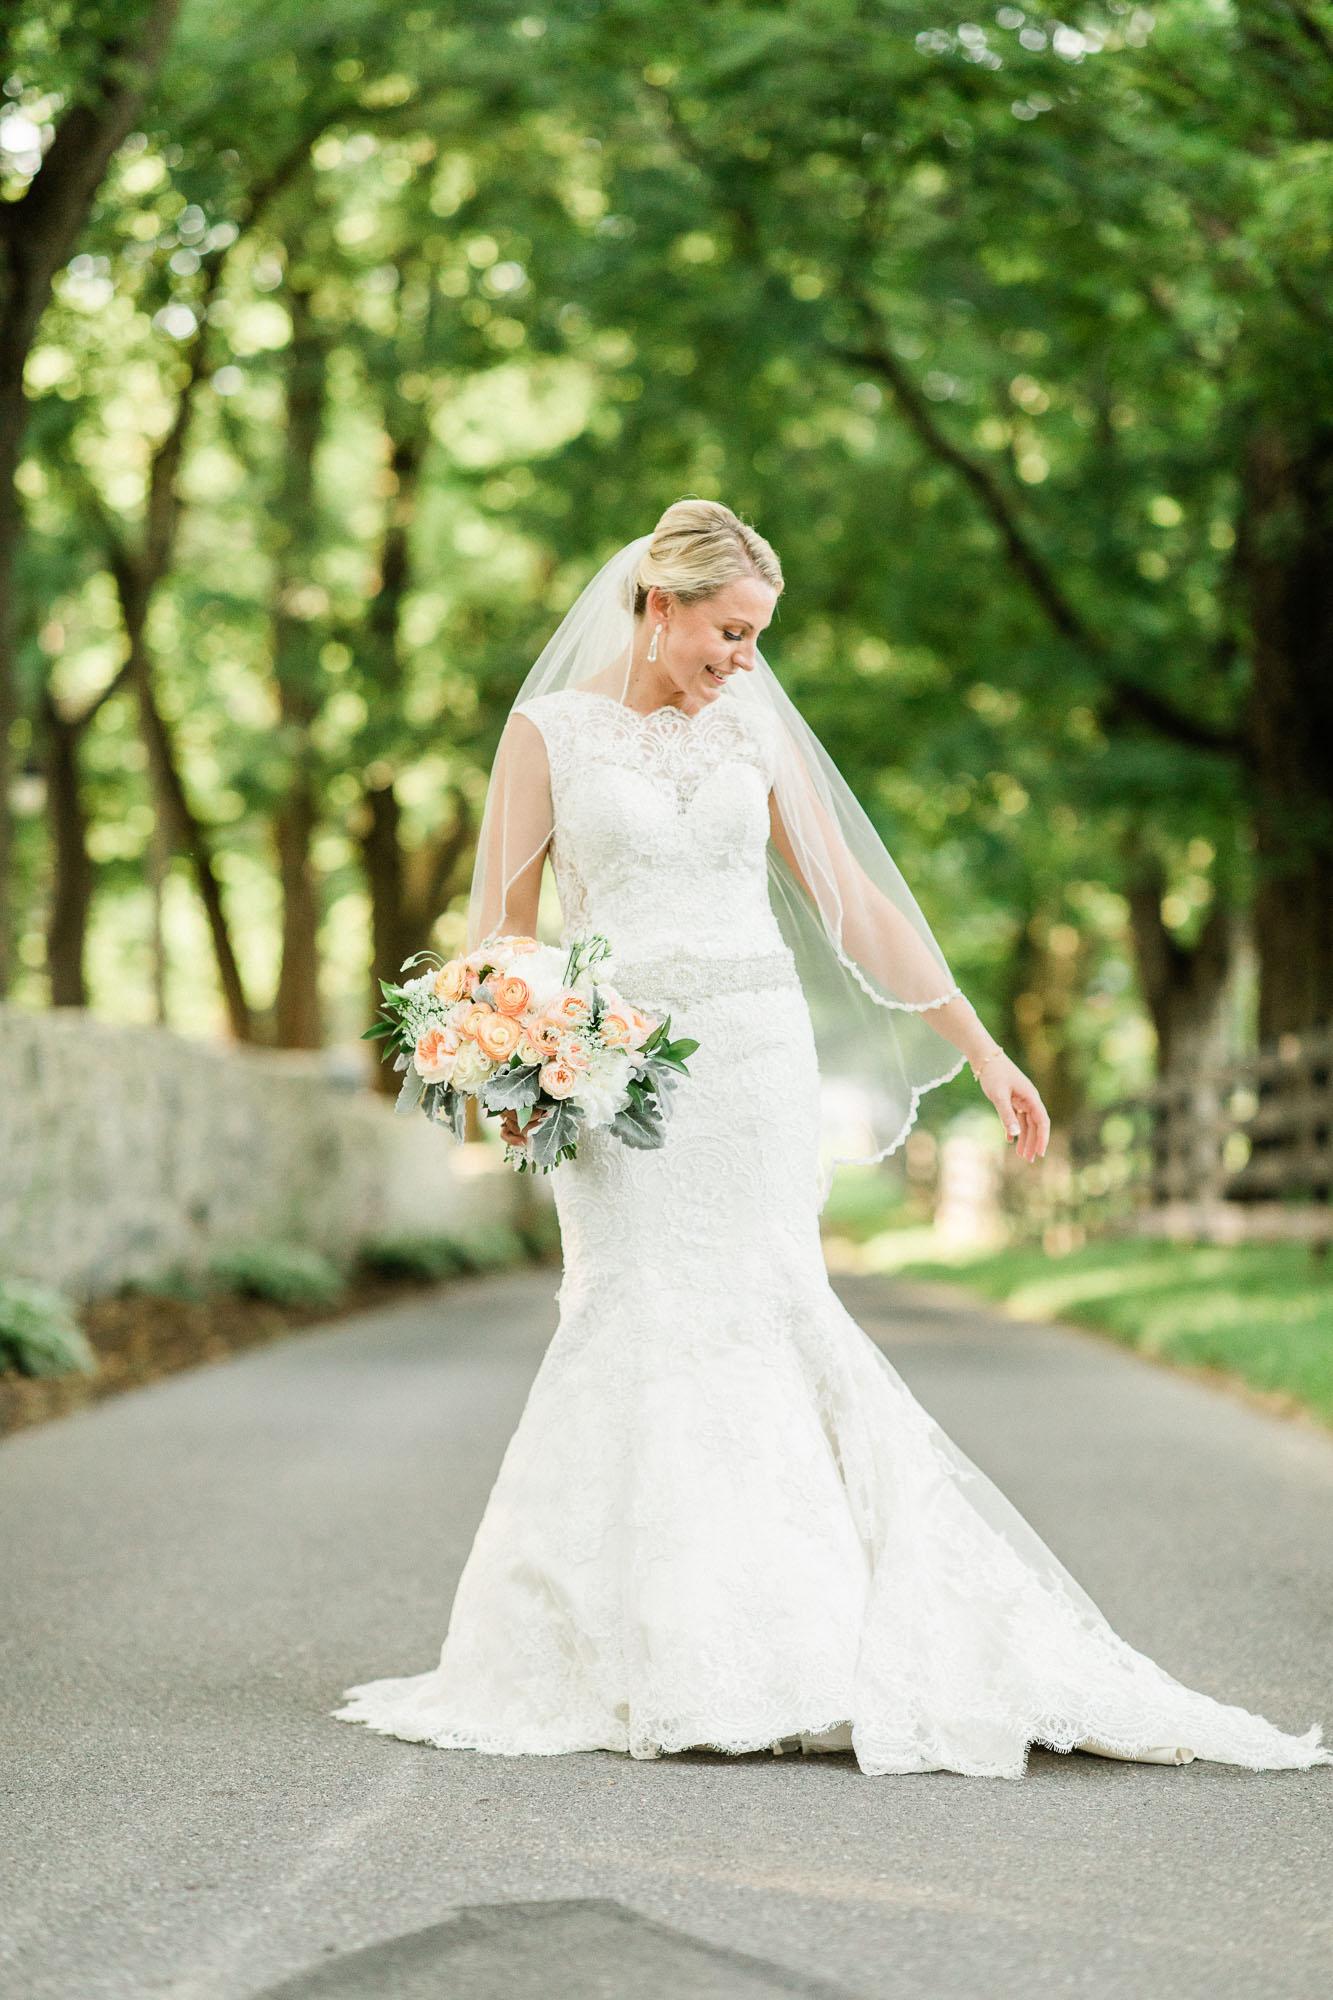 Allenberry-resort-historic-pennsylvania-wedding-22309.jpg